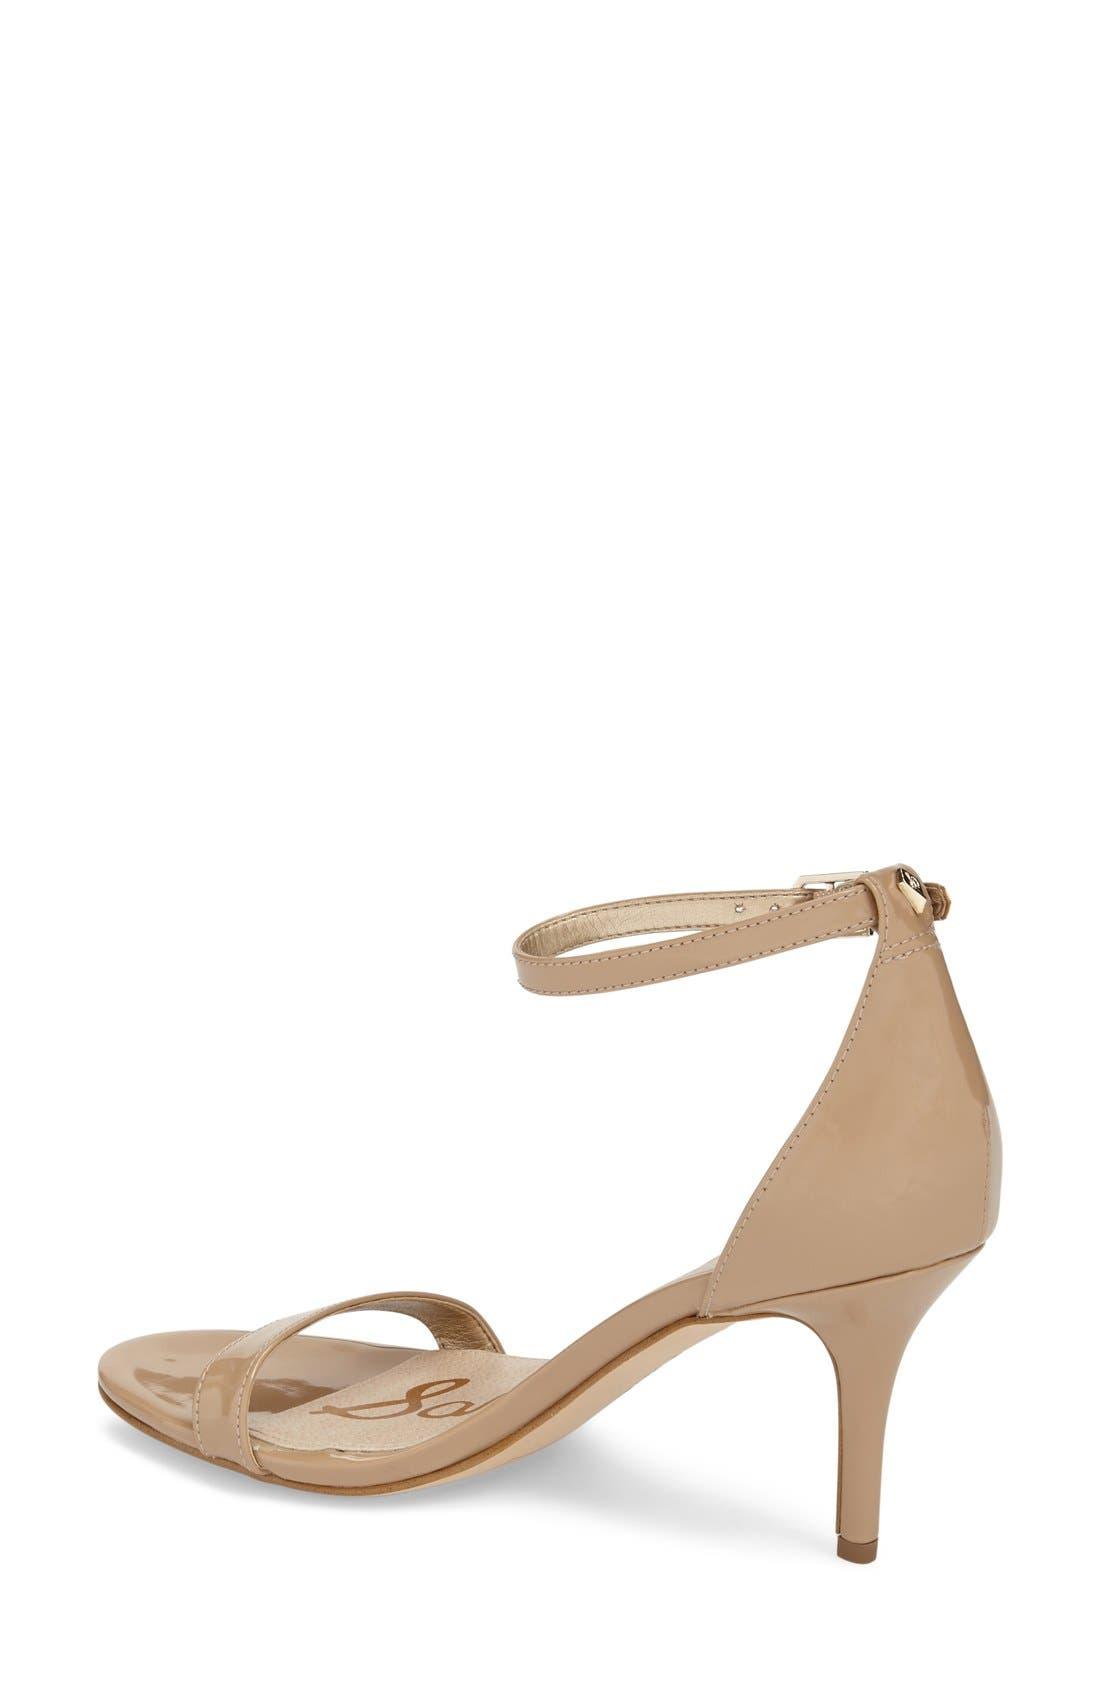 ,                             'Patti' Ankle Strap Sandal,                             Alternate thumbnail 181, color,                             252